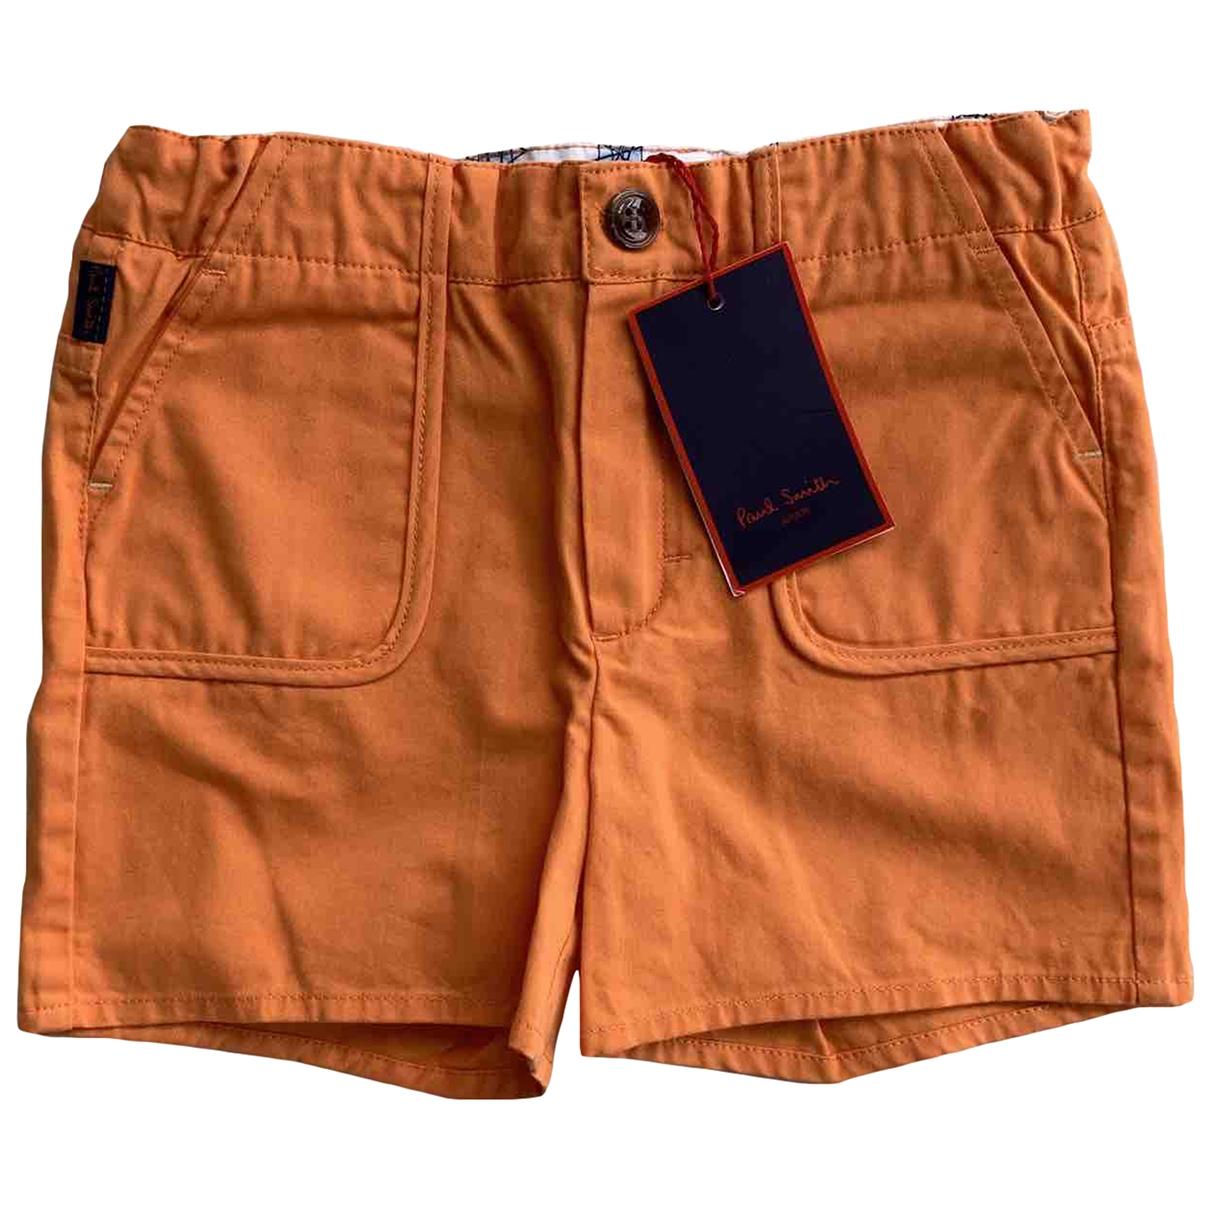 Pantalon corto Paul Smith